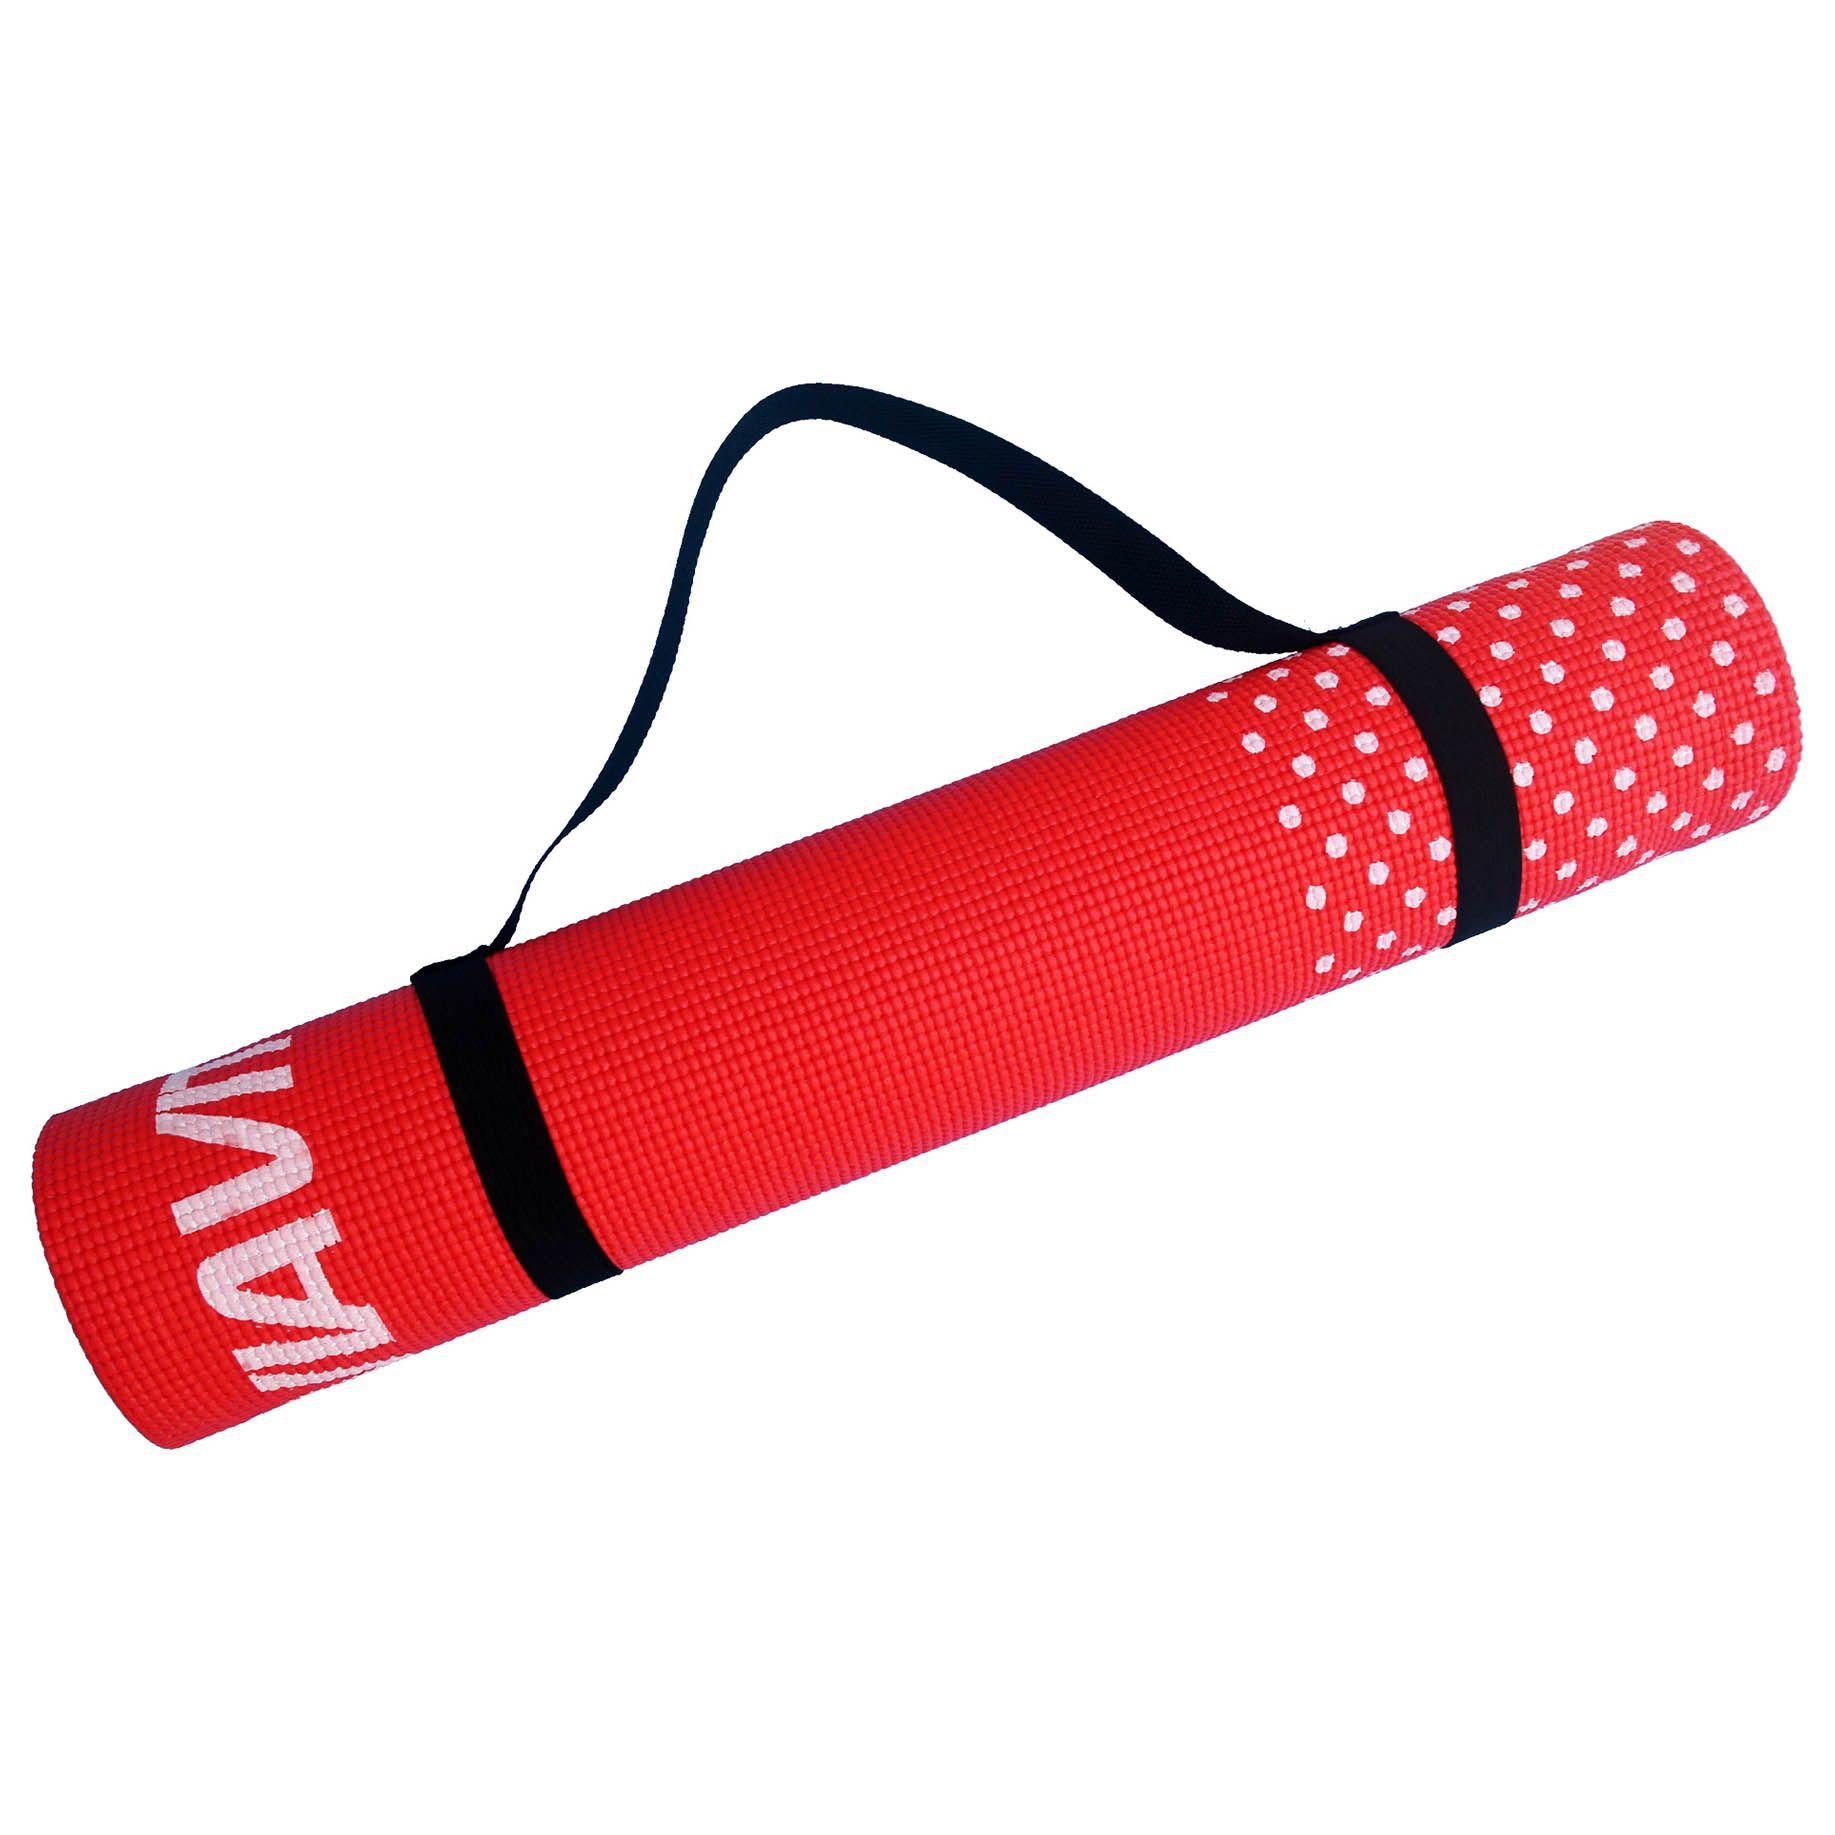 Viavito Leviato 6mm Yoga Mat With Carry Strap